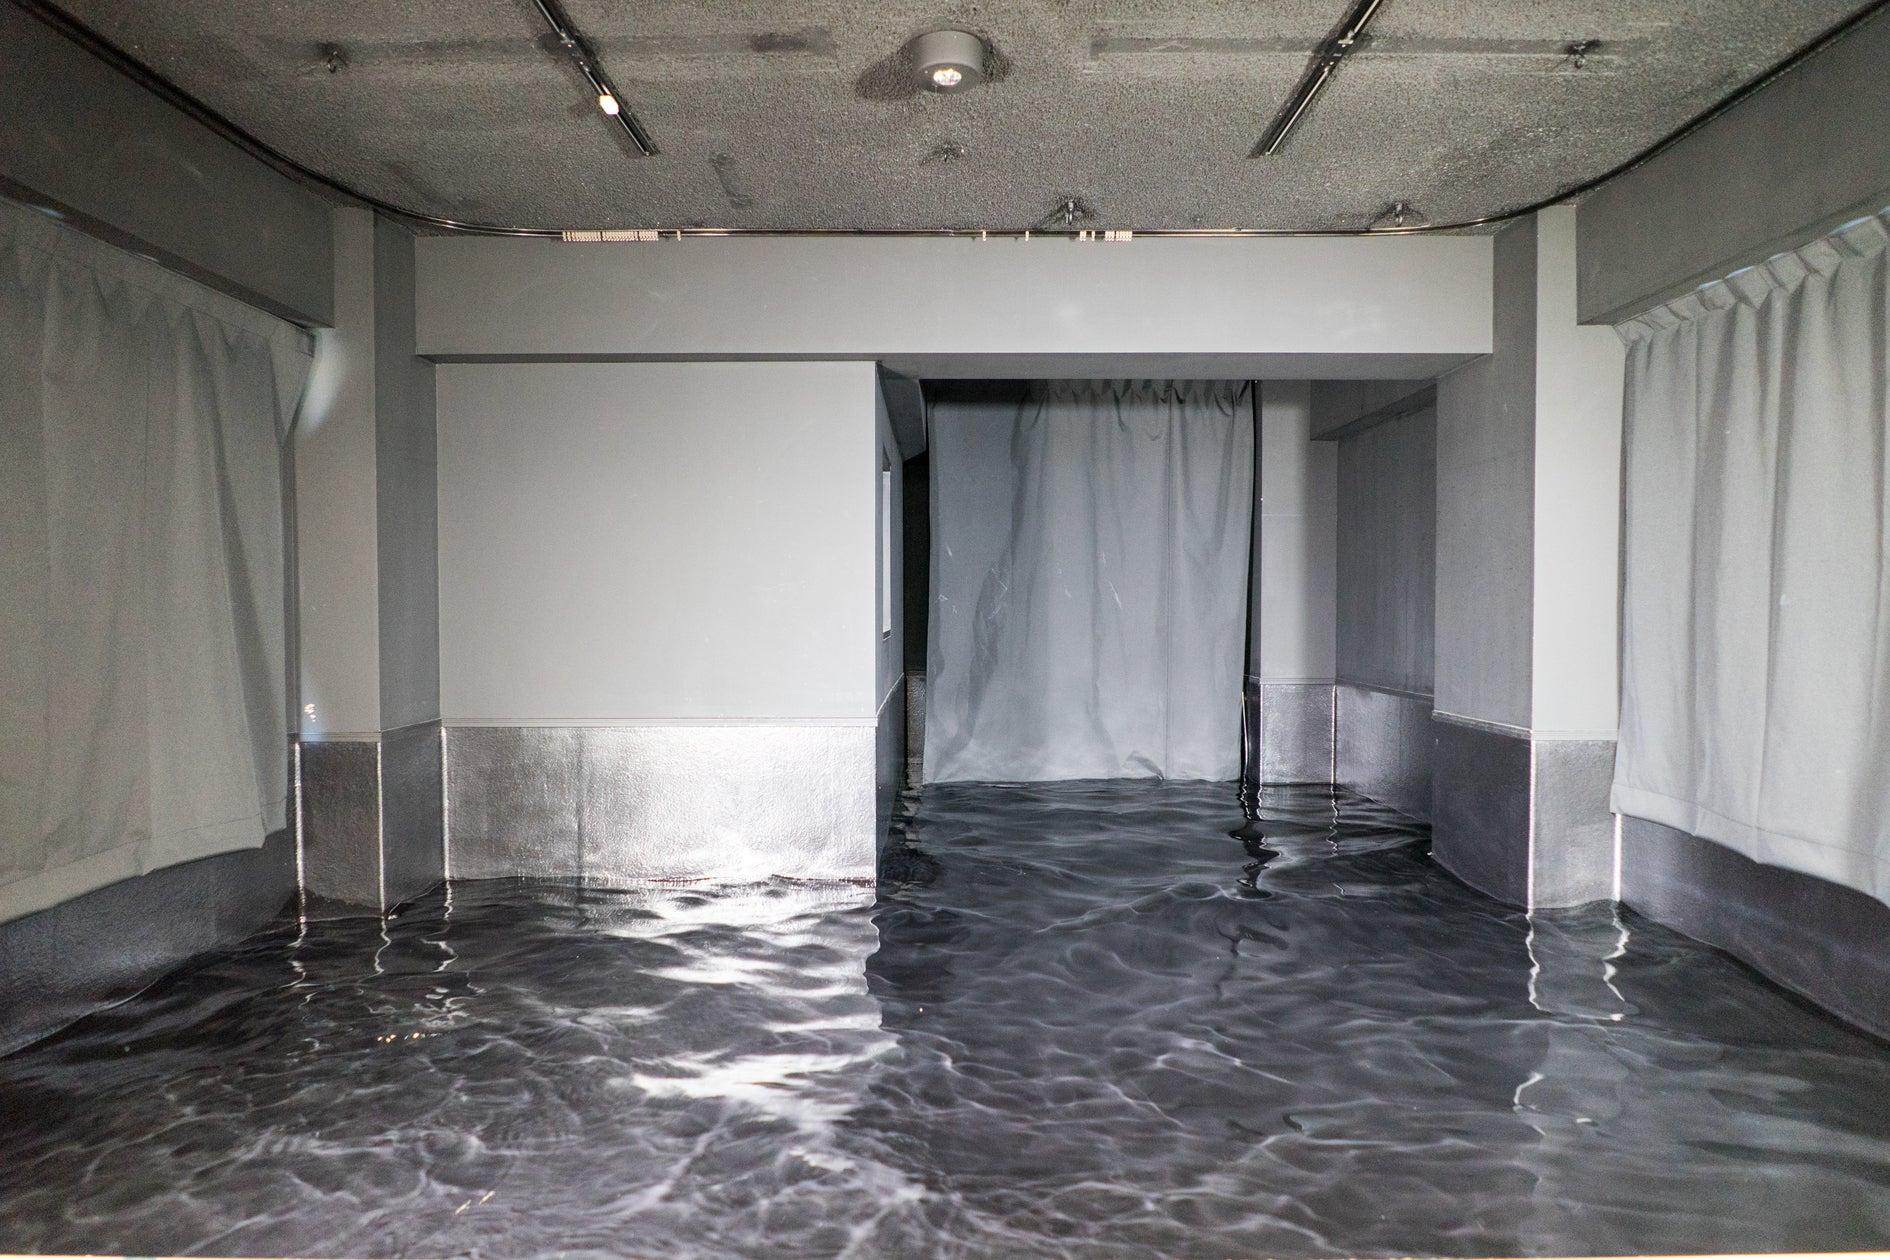 <3Fフロア> 水撮影ができる(温水可能)・黒ホリゾント・自然光・コスプレ撮影・作品撮り(Studio Garden Quartz -スタジオガーデンクォーツ-) の写真0